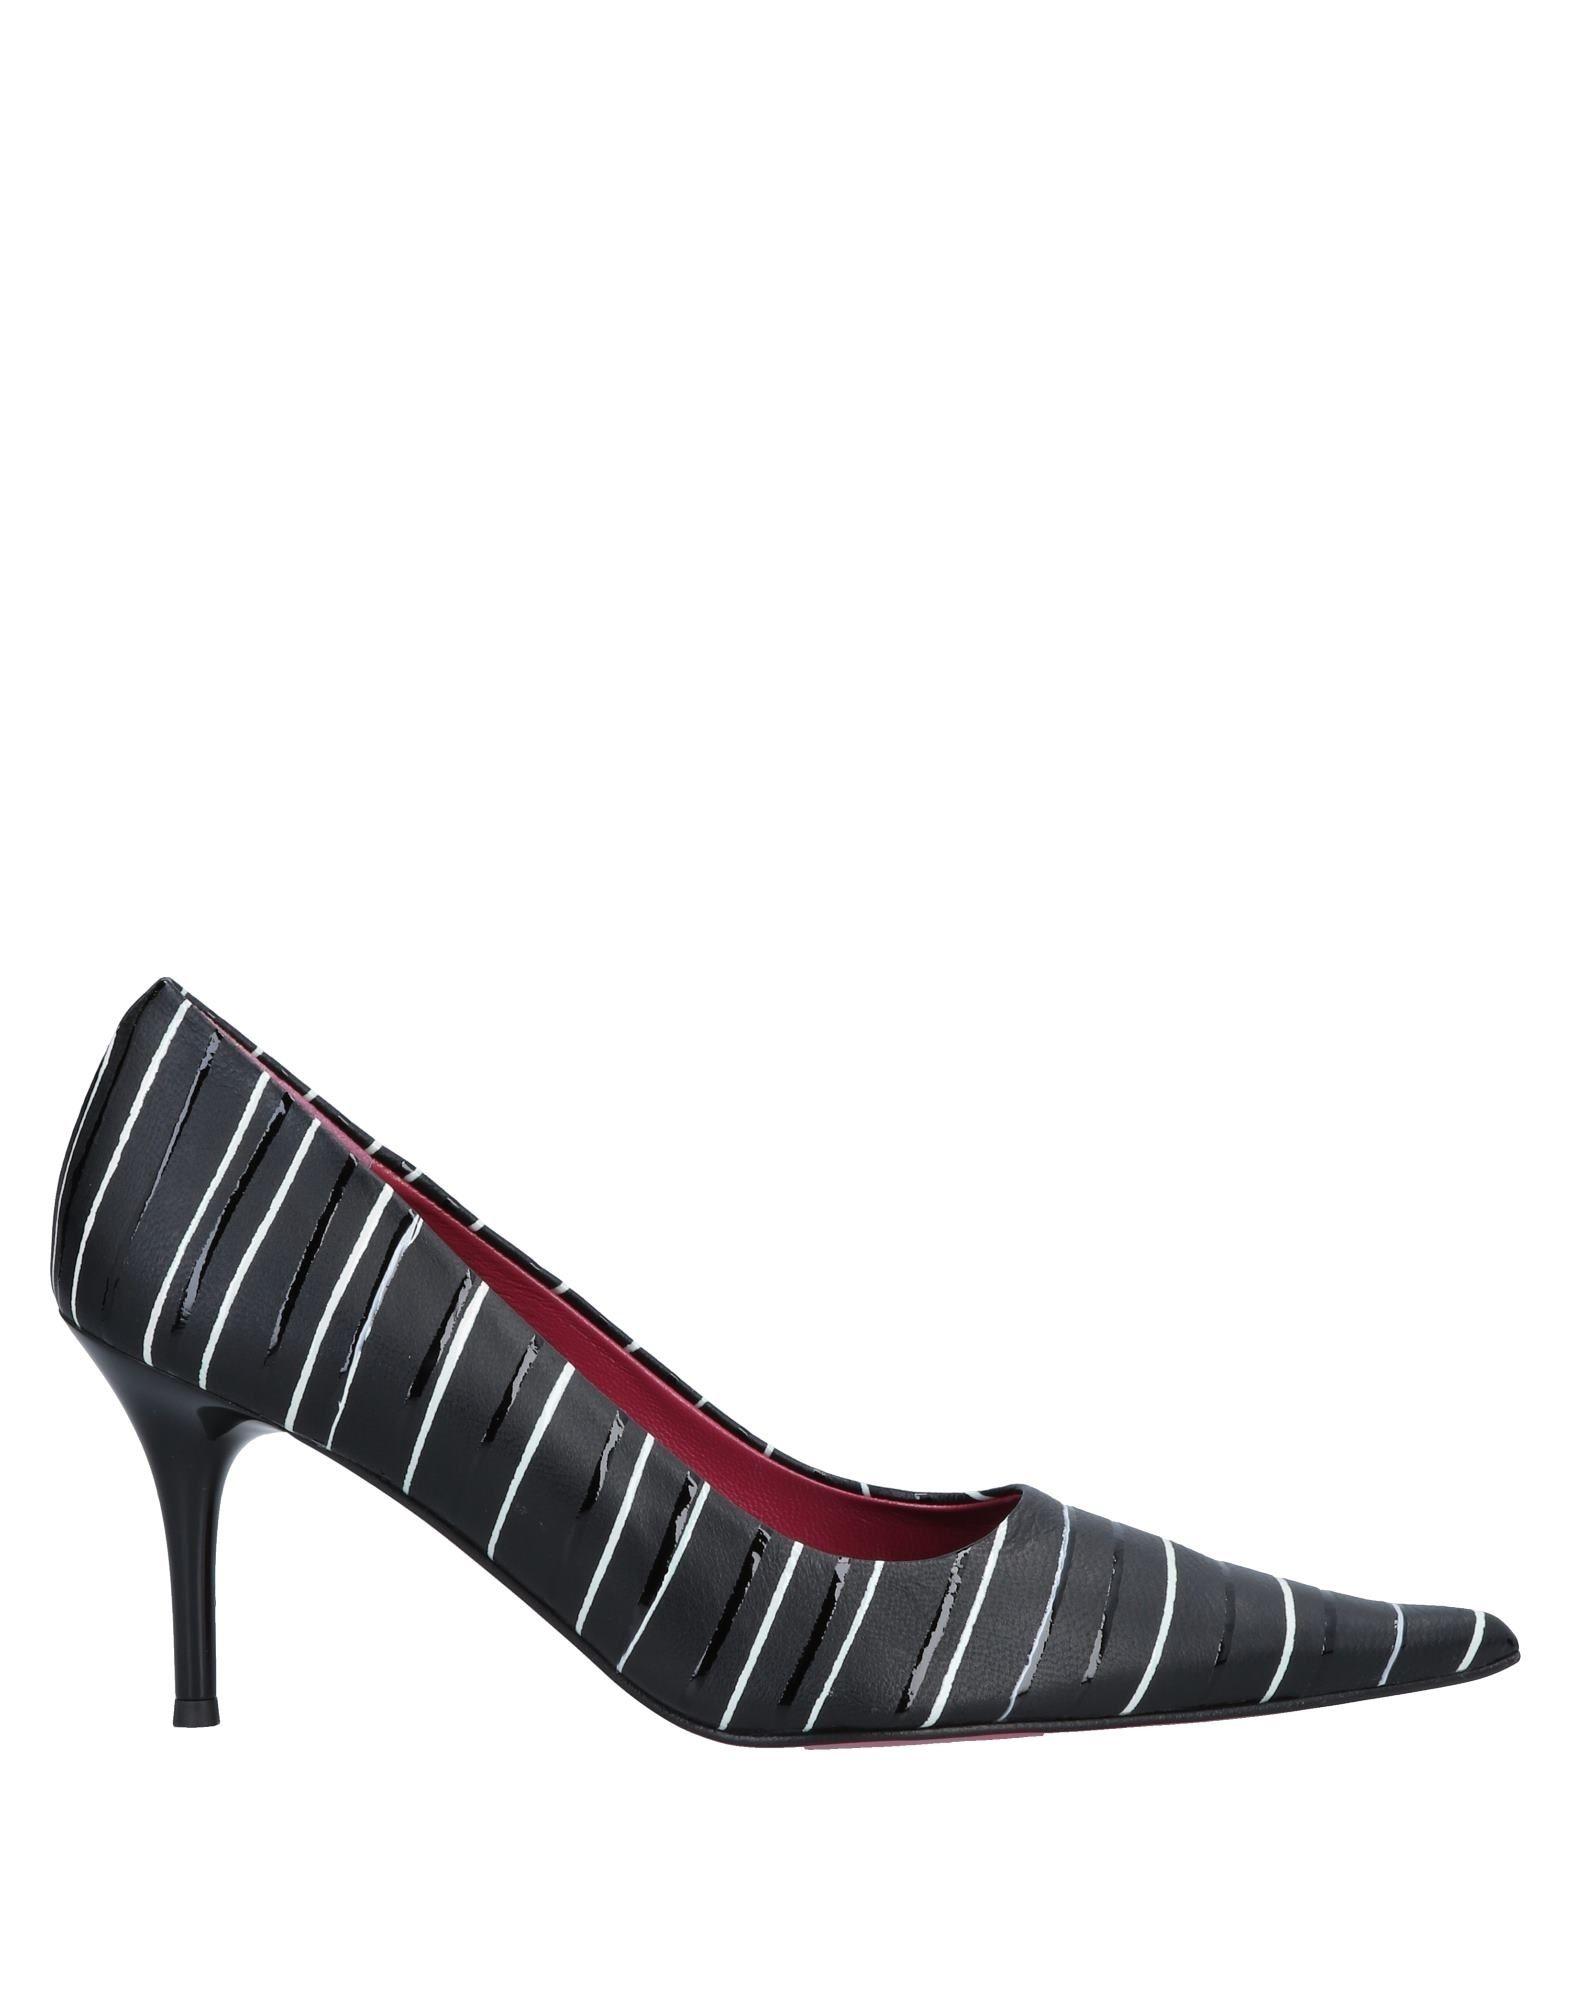 Stilvolle Damen billige Schuhe Versace Pumps Damen Stilvolle  11567000AO f45c04